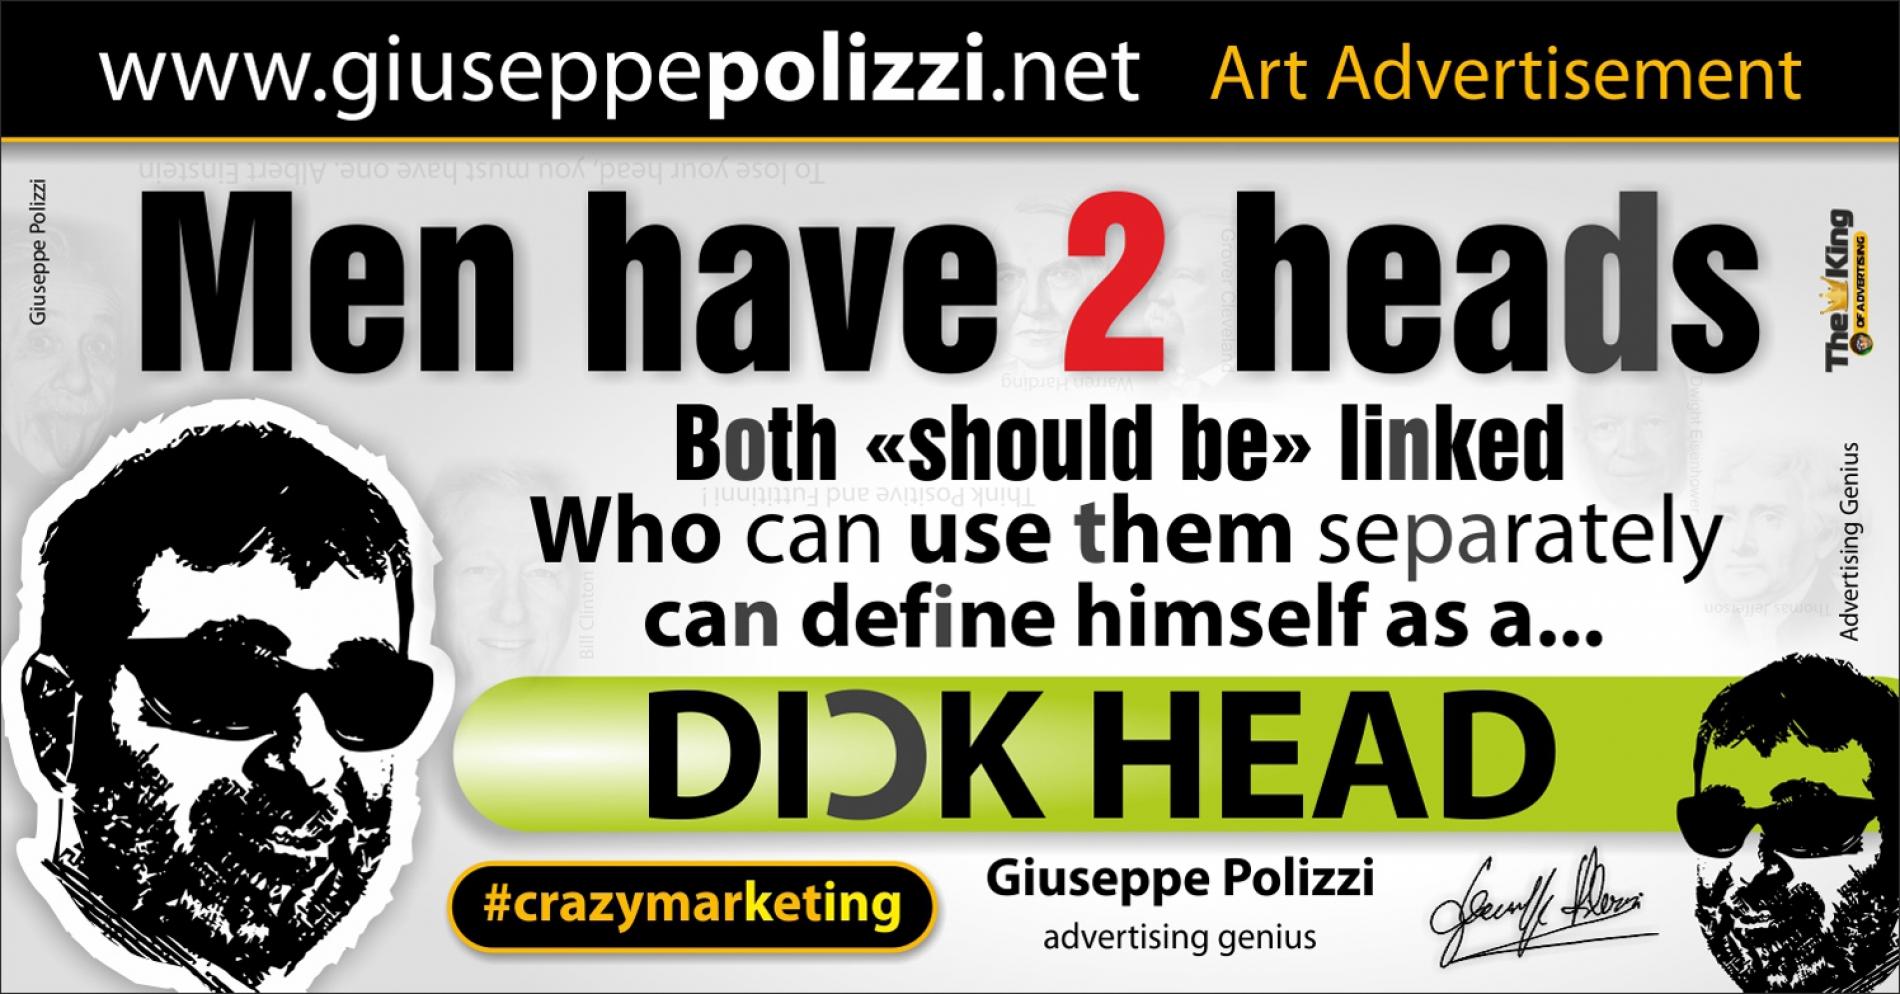 giuseppe polizzi aforismi usare la testa 2016 crazy marketing inglese